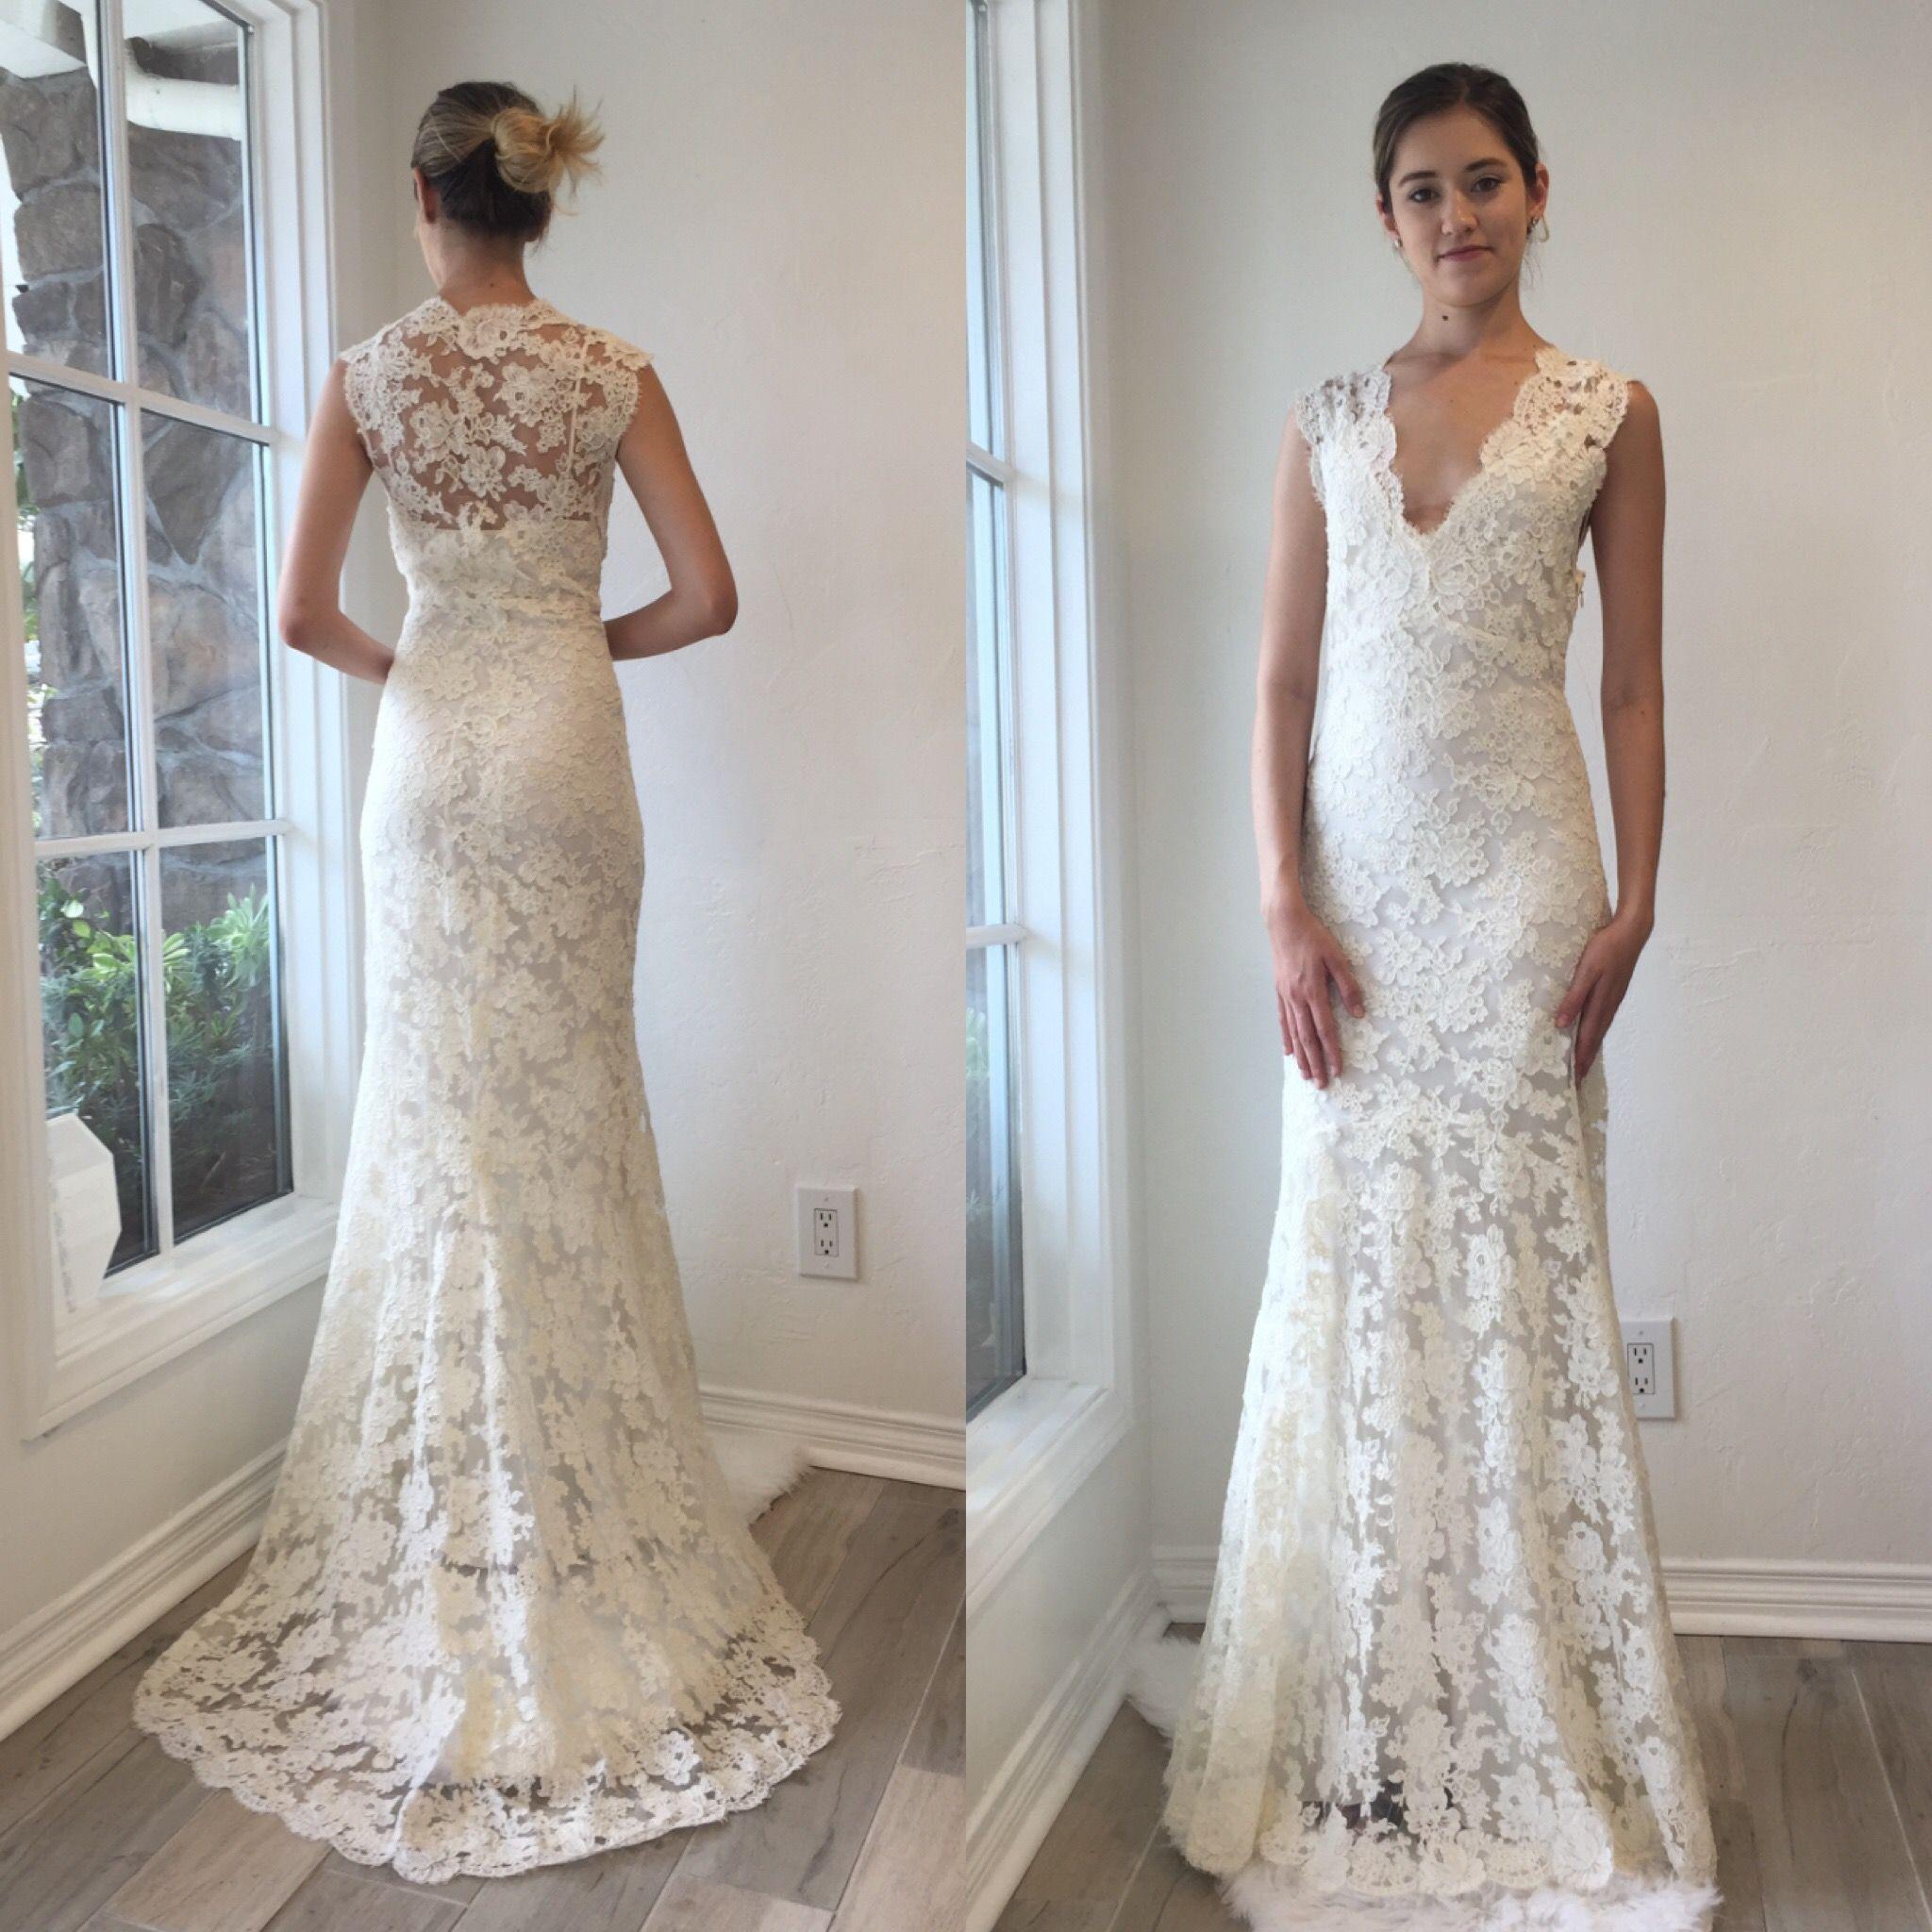 SOLD. Monique Lhuillier sample dress... new markdown $1,000. $1,200 ...